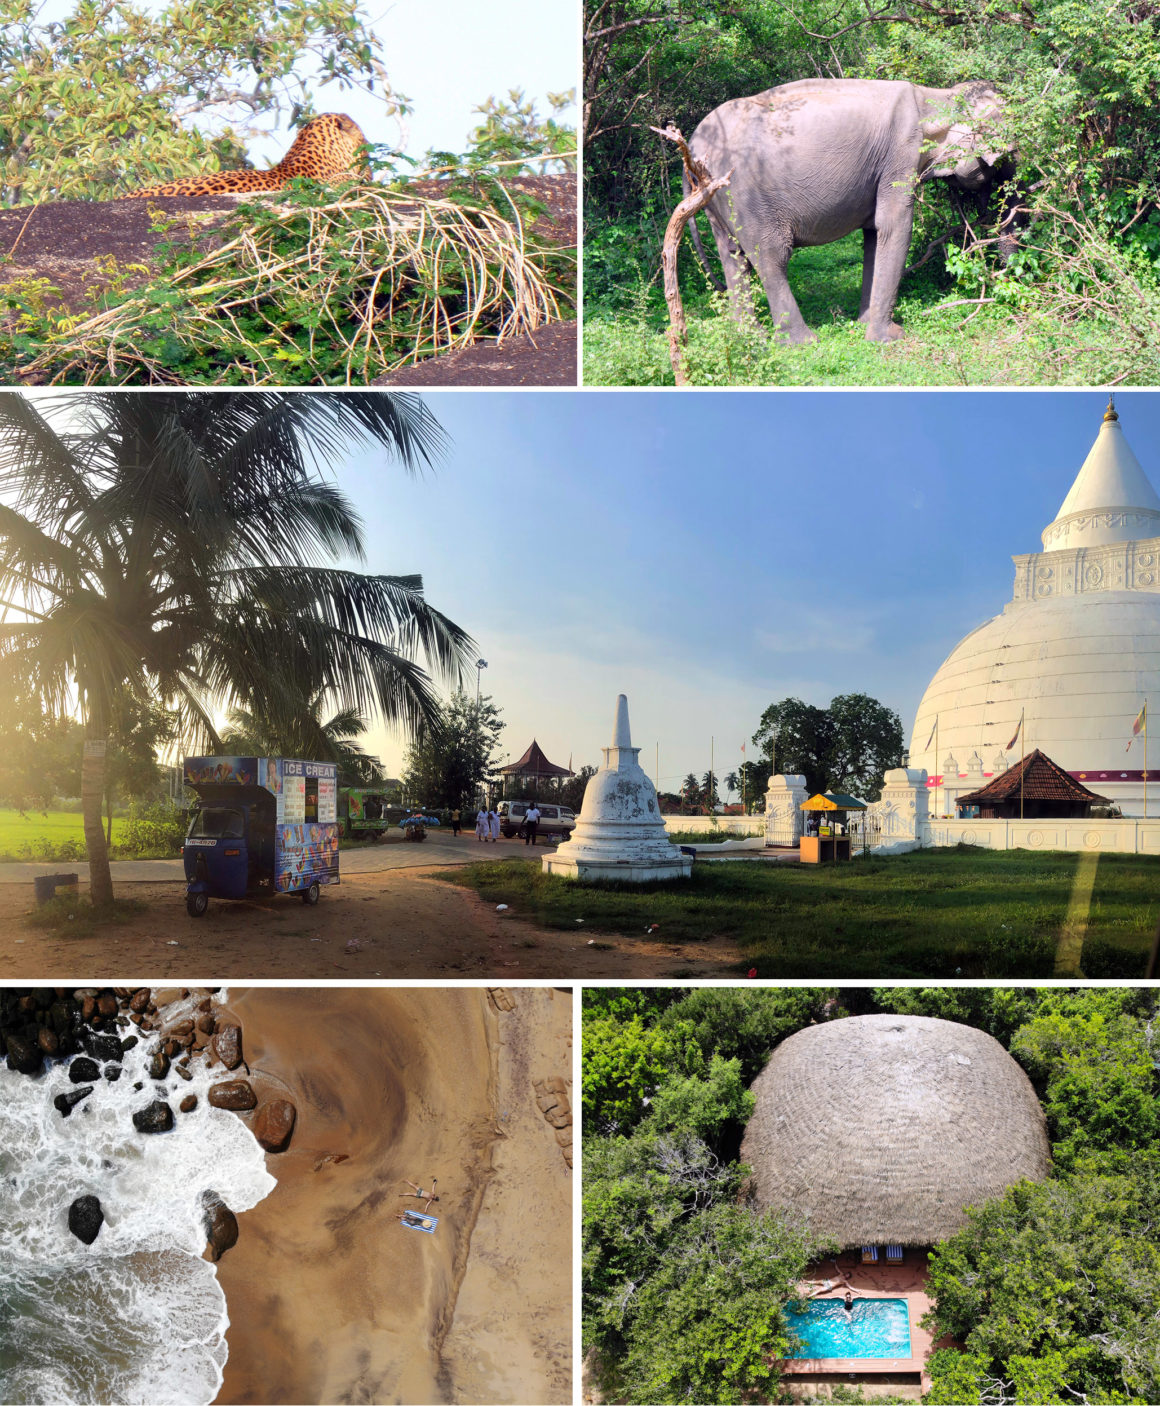 ruta por Sri Lanka en 8 días ruta por sri lanka en 8 días - thewotme chena huts yala national park leopard 1160x1406 - Nuestra ruta por Sri Lanka en 8 días, diario de viaje